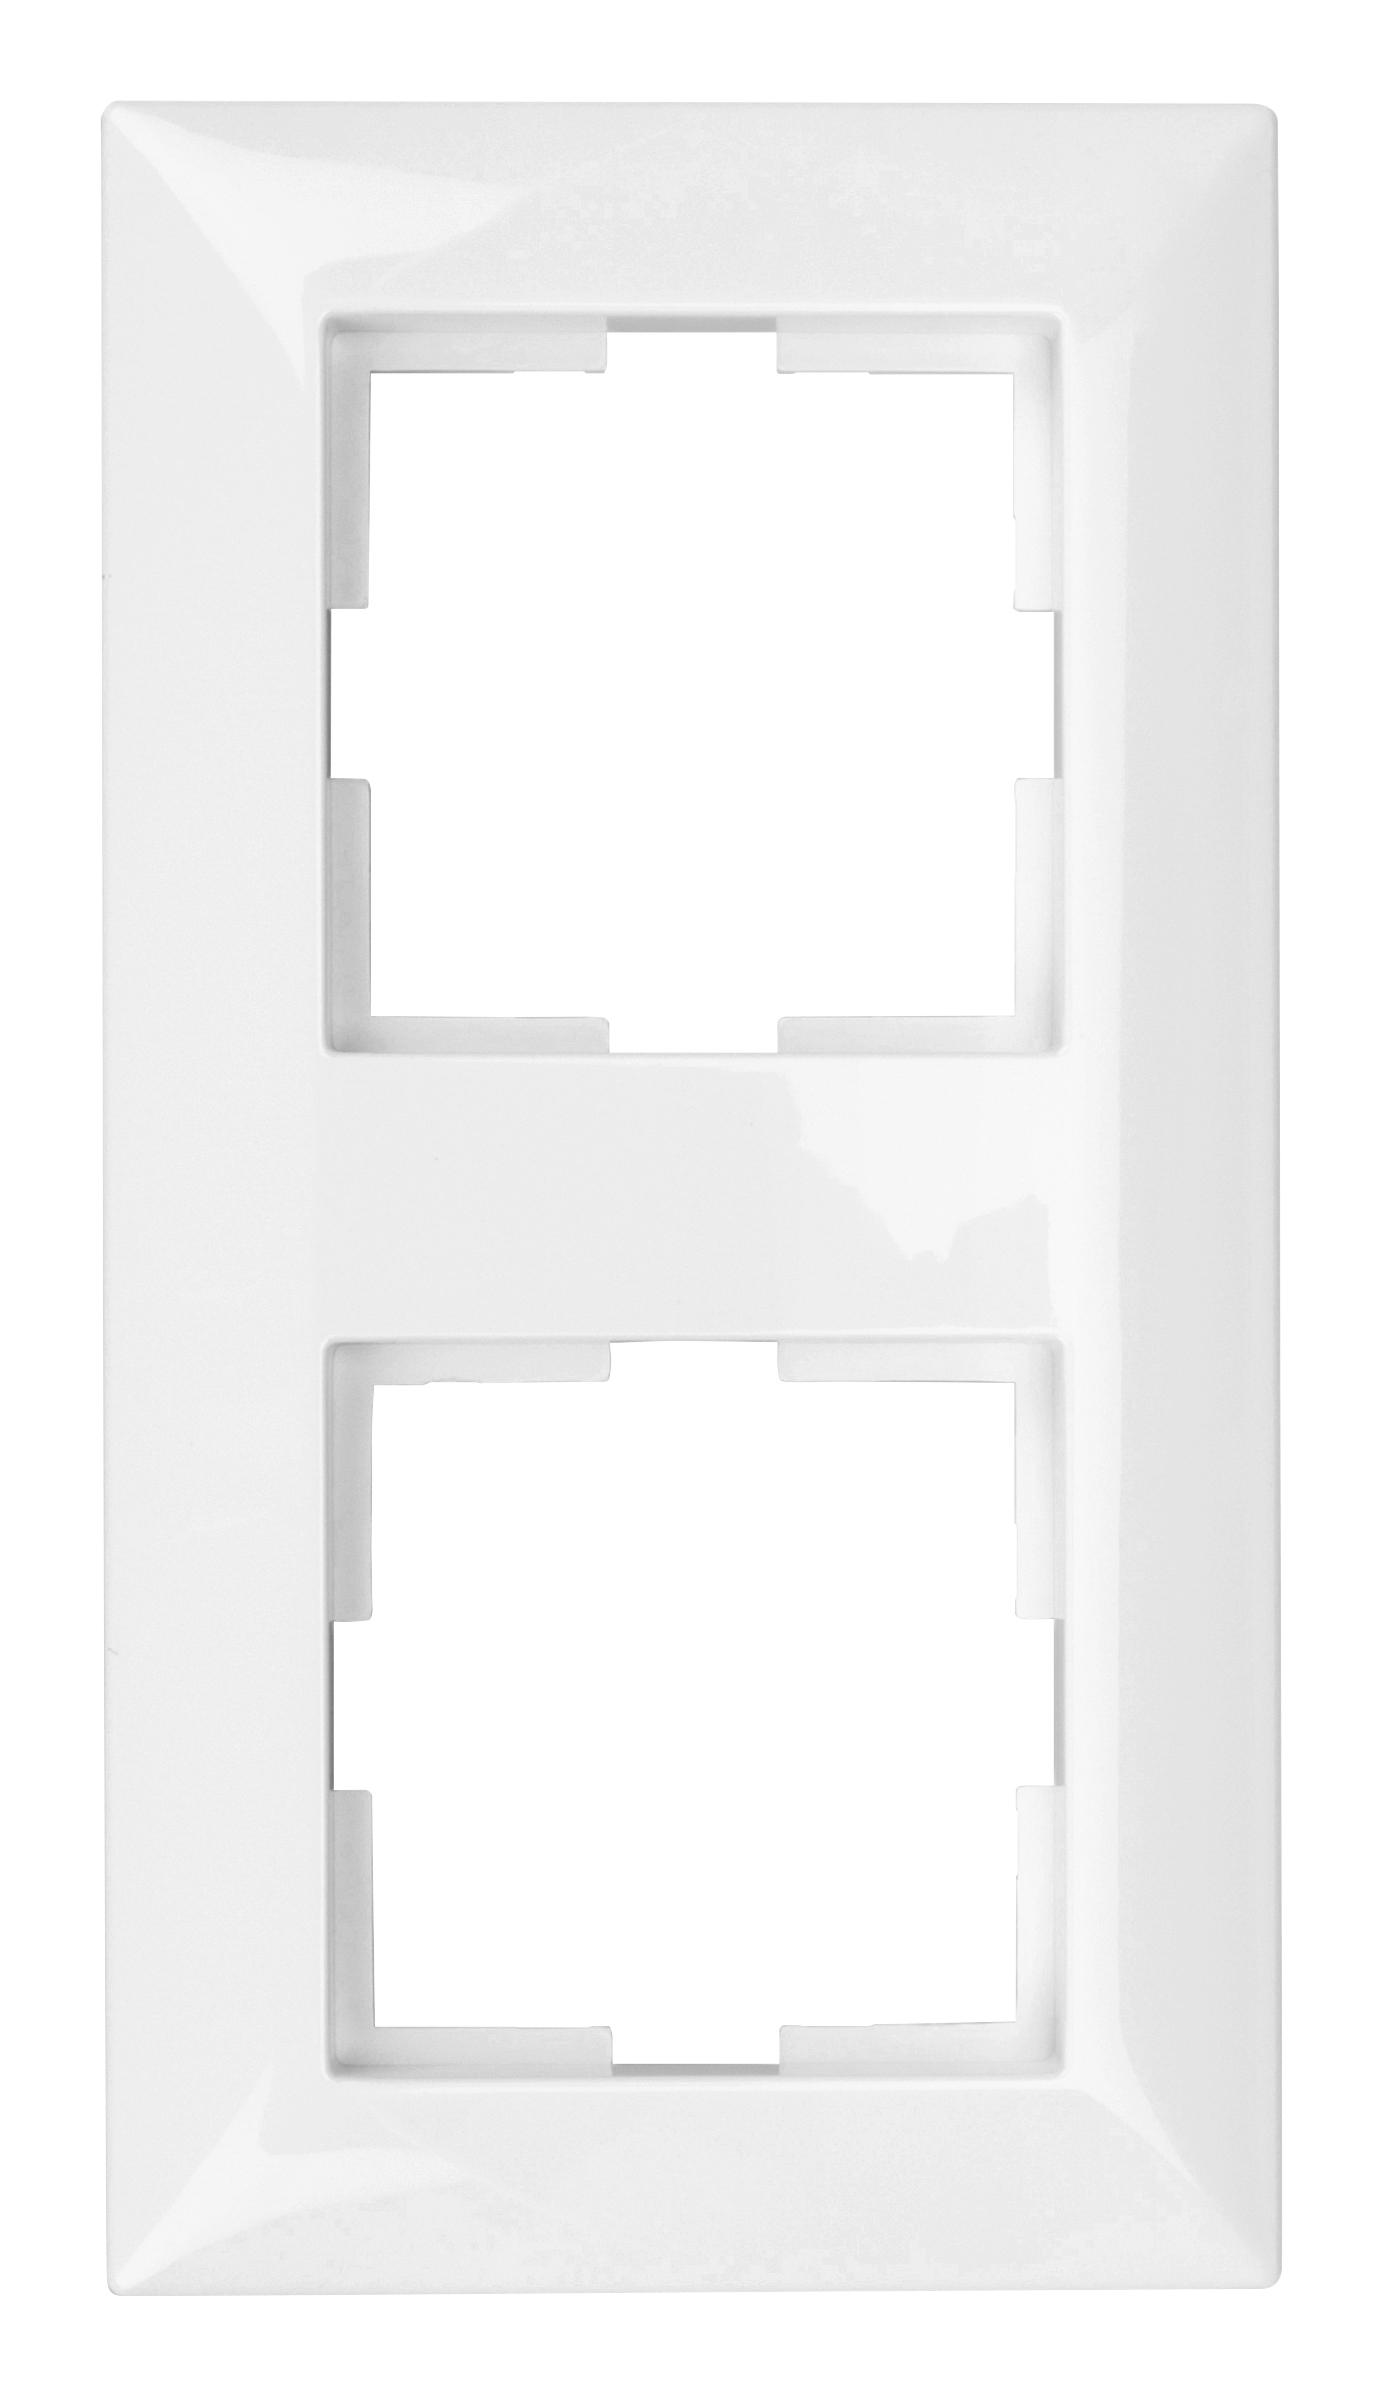 1 Stk Rahmen 2-fach, weiß EV105002--